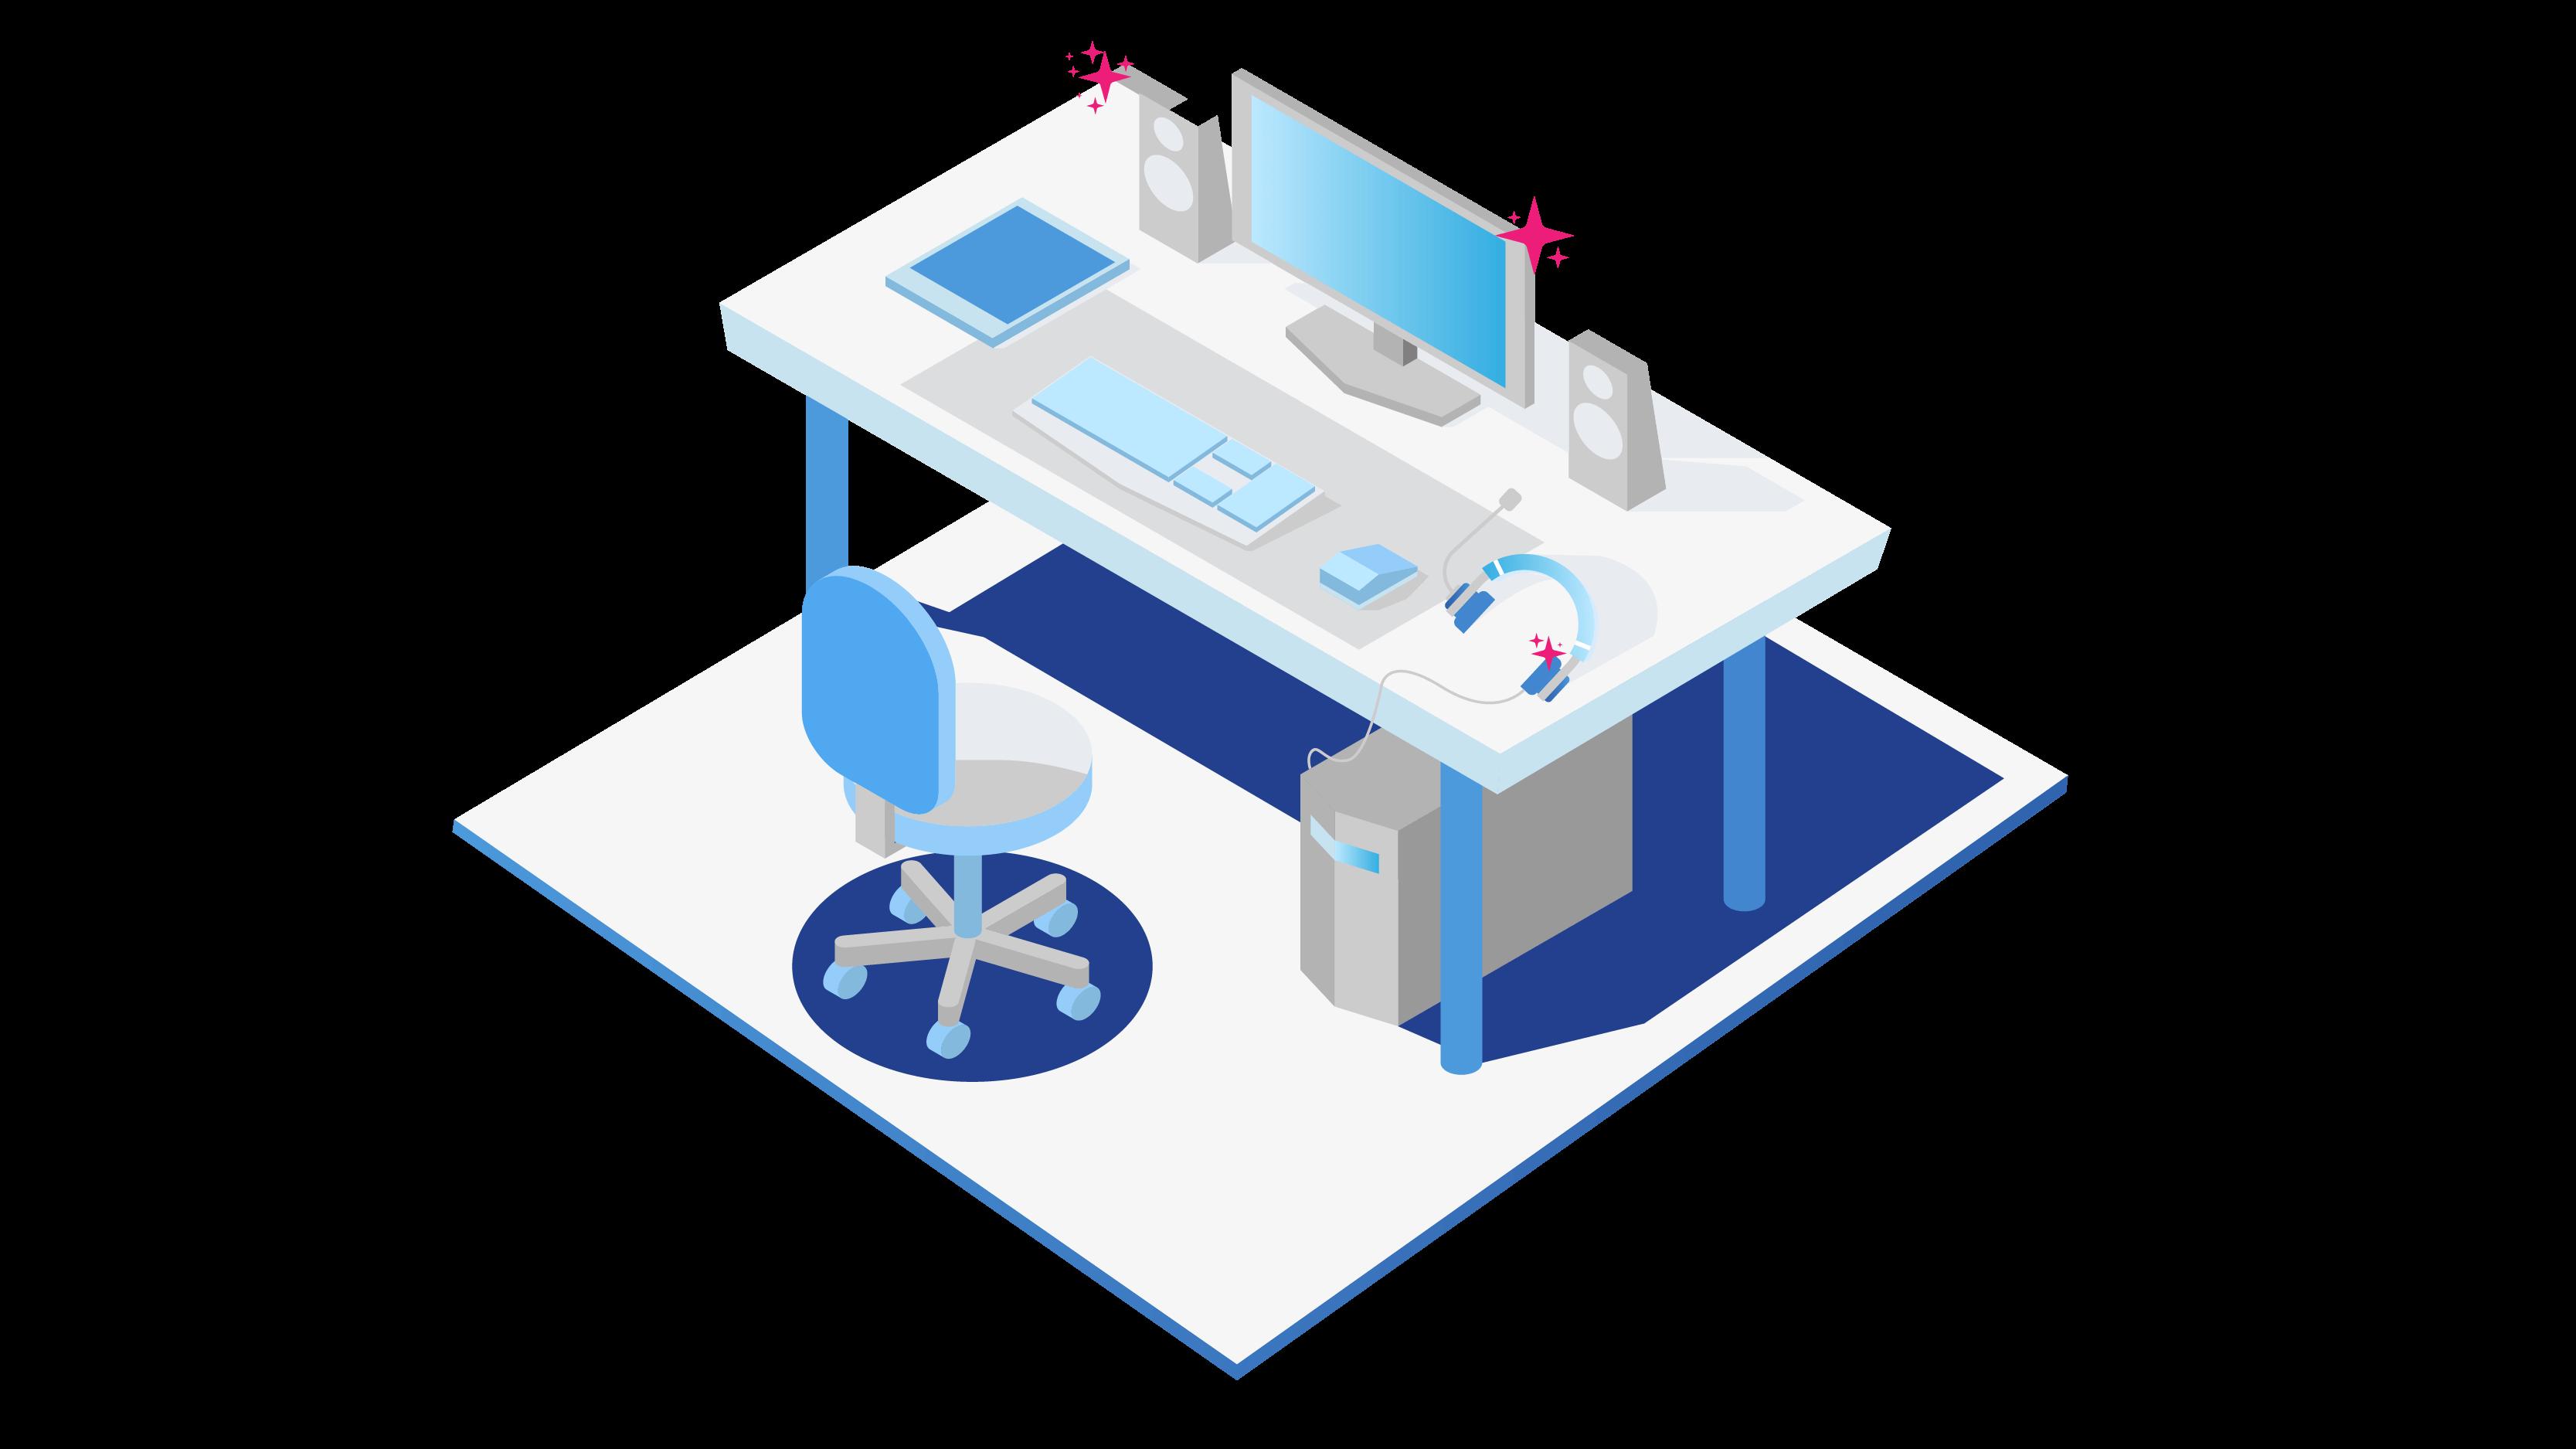 Optimized gaming computer setup